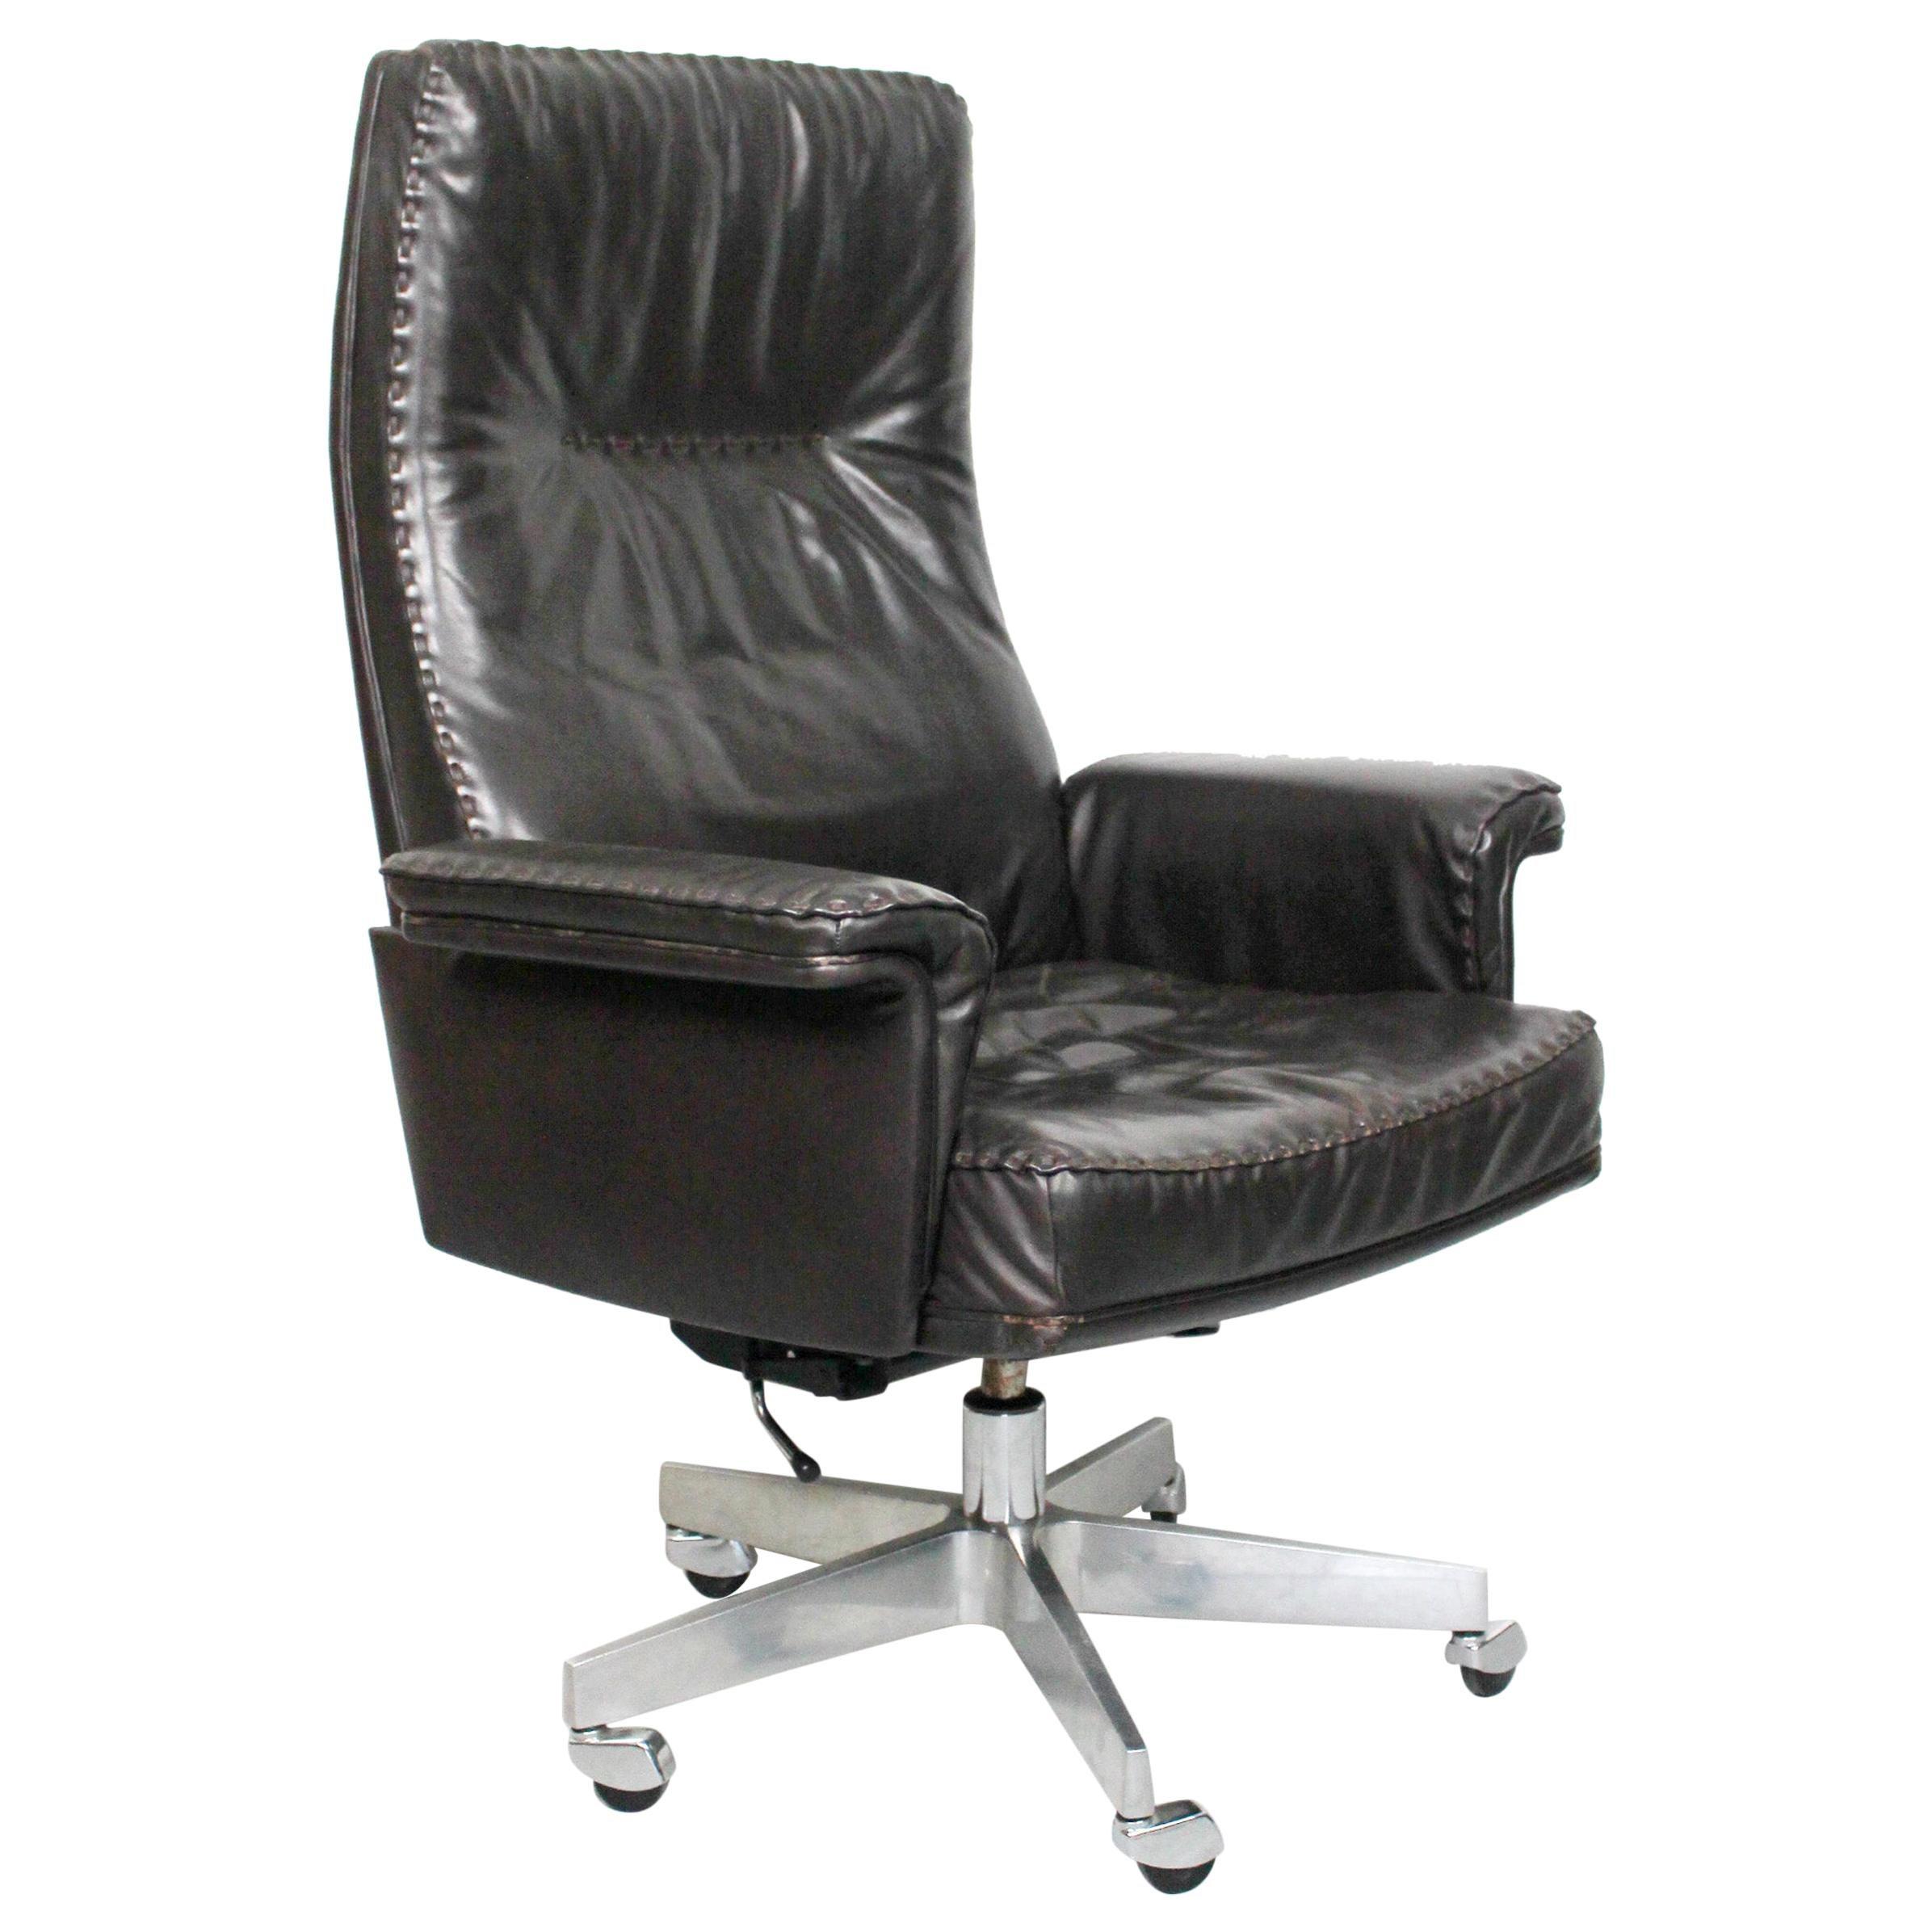 Swell Vintage Recliner Chairs 127 For Sale On 1Stdibs Short Links Chair Design For Home Short Linksinfo